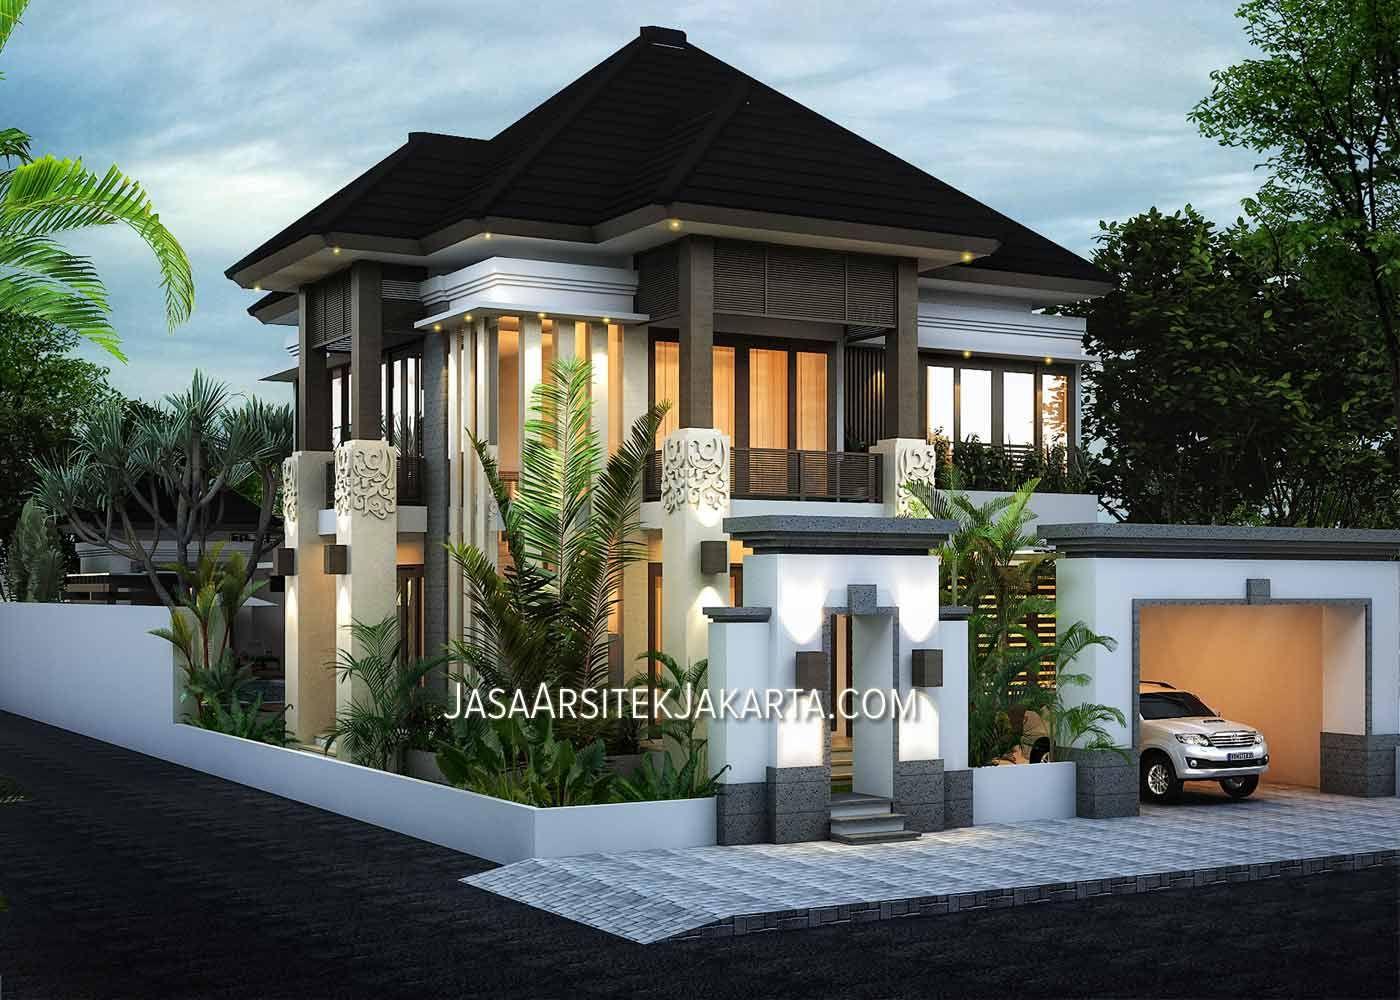 Desain Rumah Luas 350 M2 Pak Ahmad Jakarta Jasa Arsitek Jakarta Desain Rumah Arsitektur Desain Rumah 2 Lantai